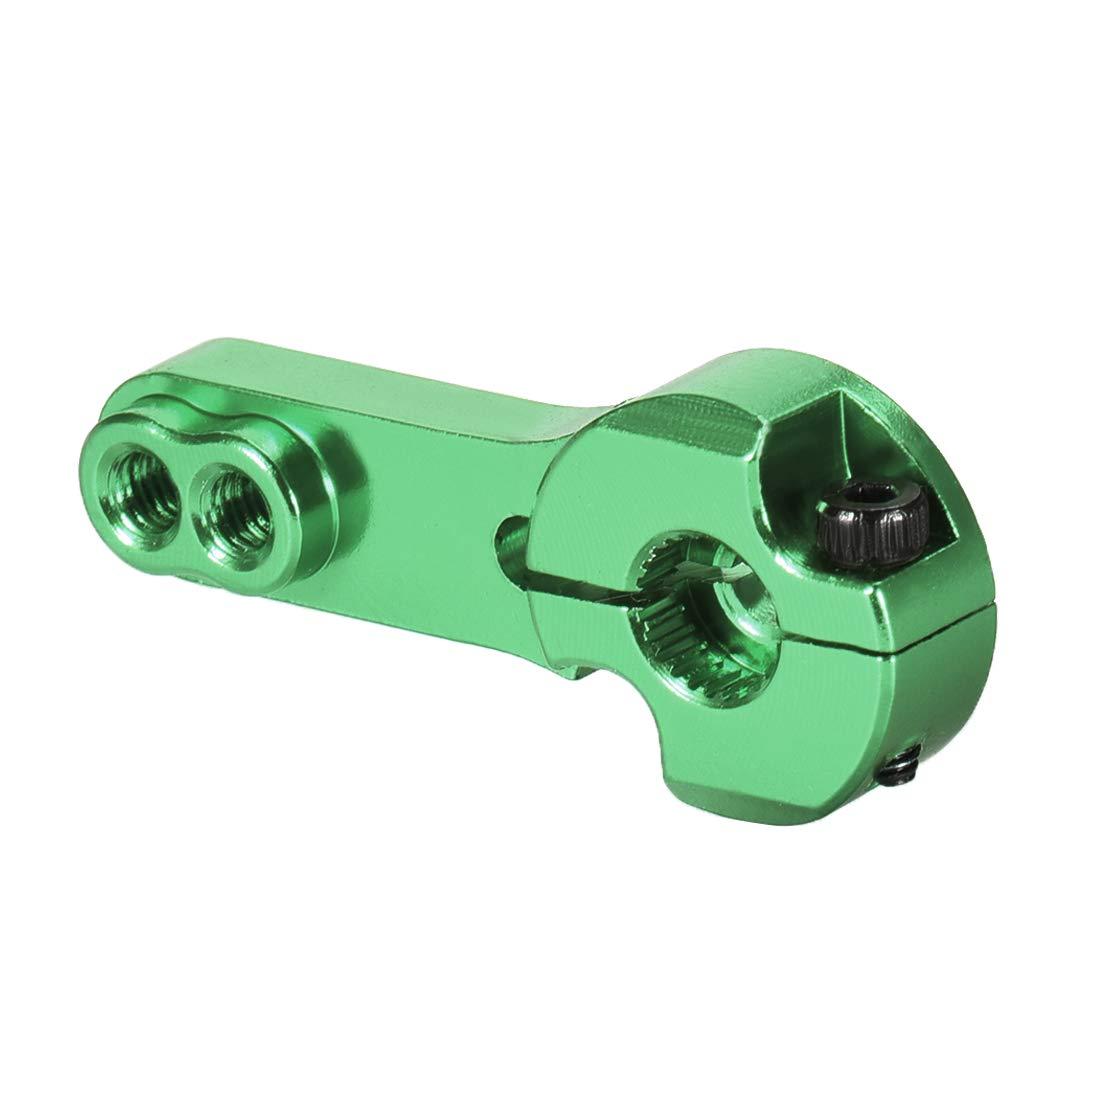 for Futaba Savox Xcore HL HSP HD Power Go Tech,2pcs uxcell Aluminum Servo Horn 25T M3 Thread Green